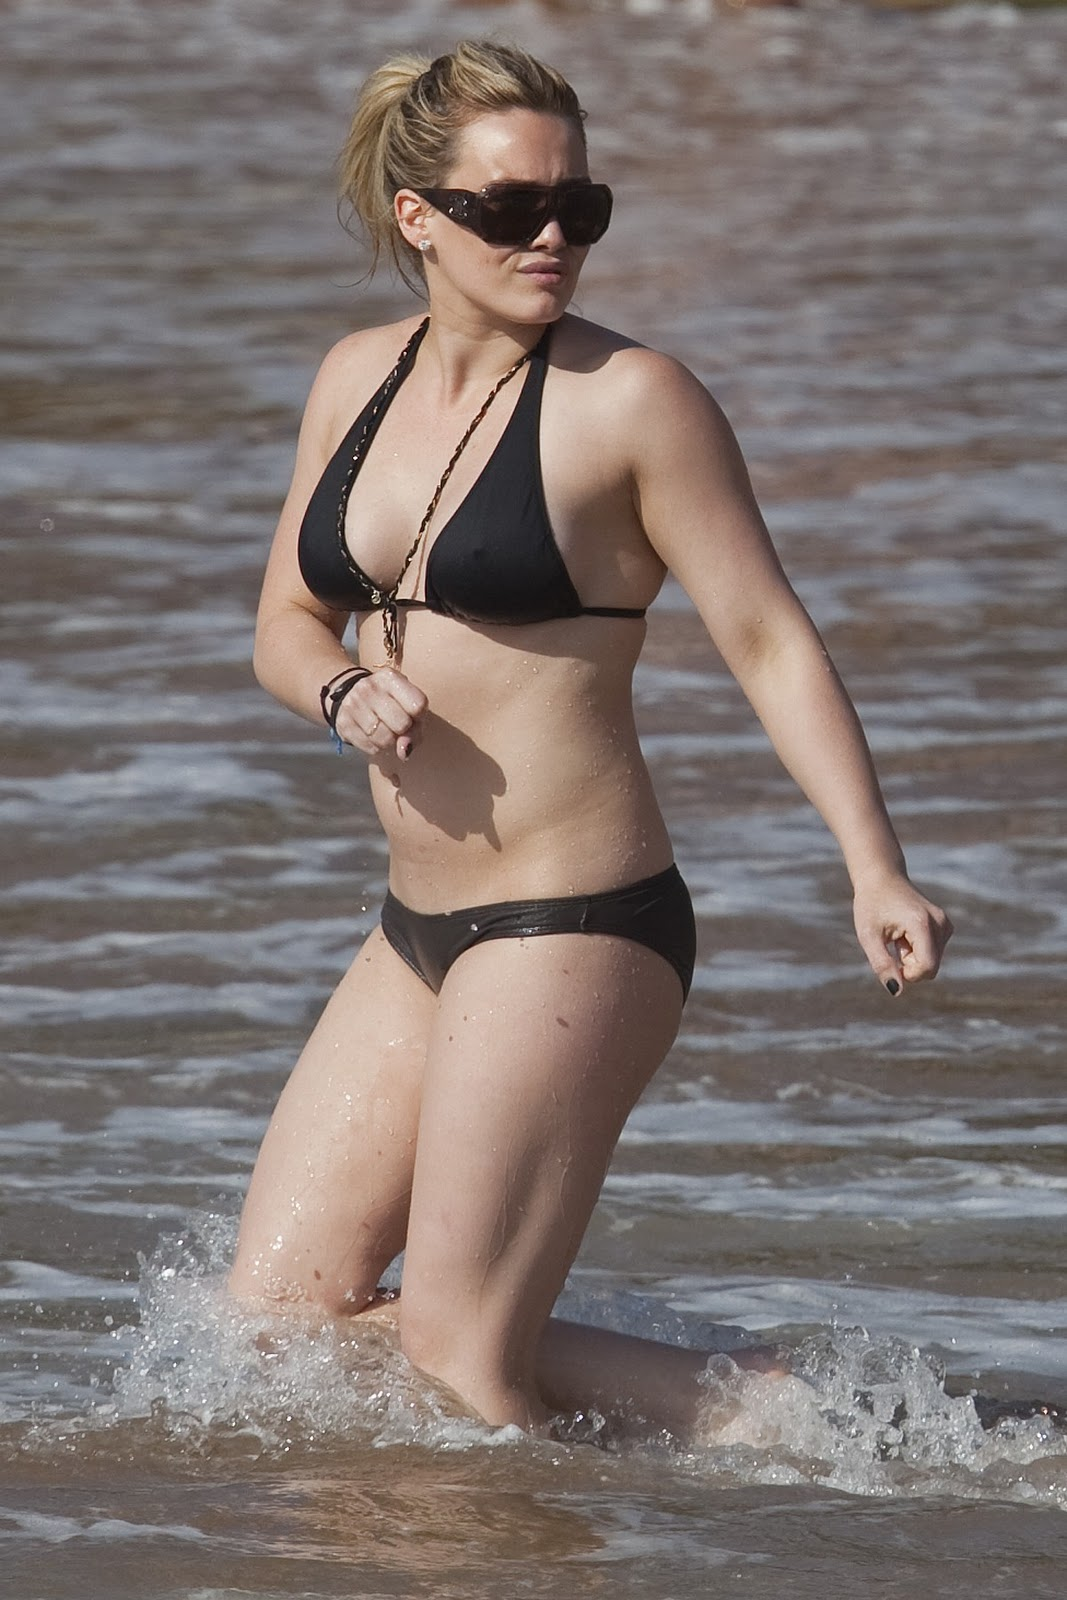 Hot & Sexy Blog: Hilary Duff.....Born to be Super star Hilary Duff